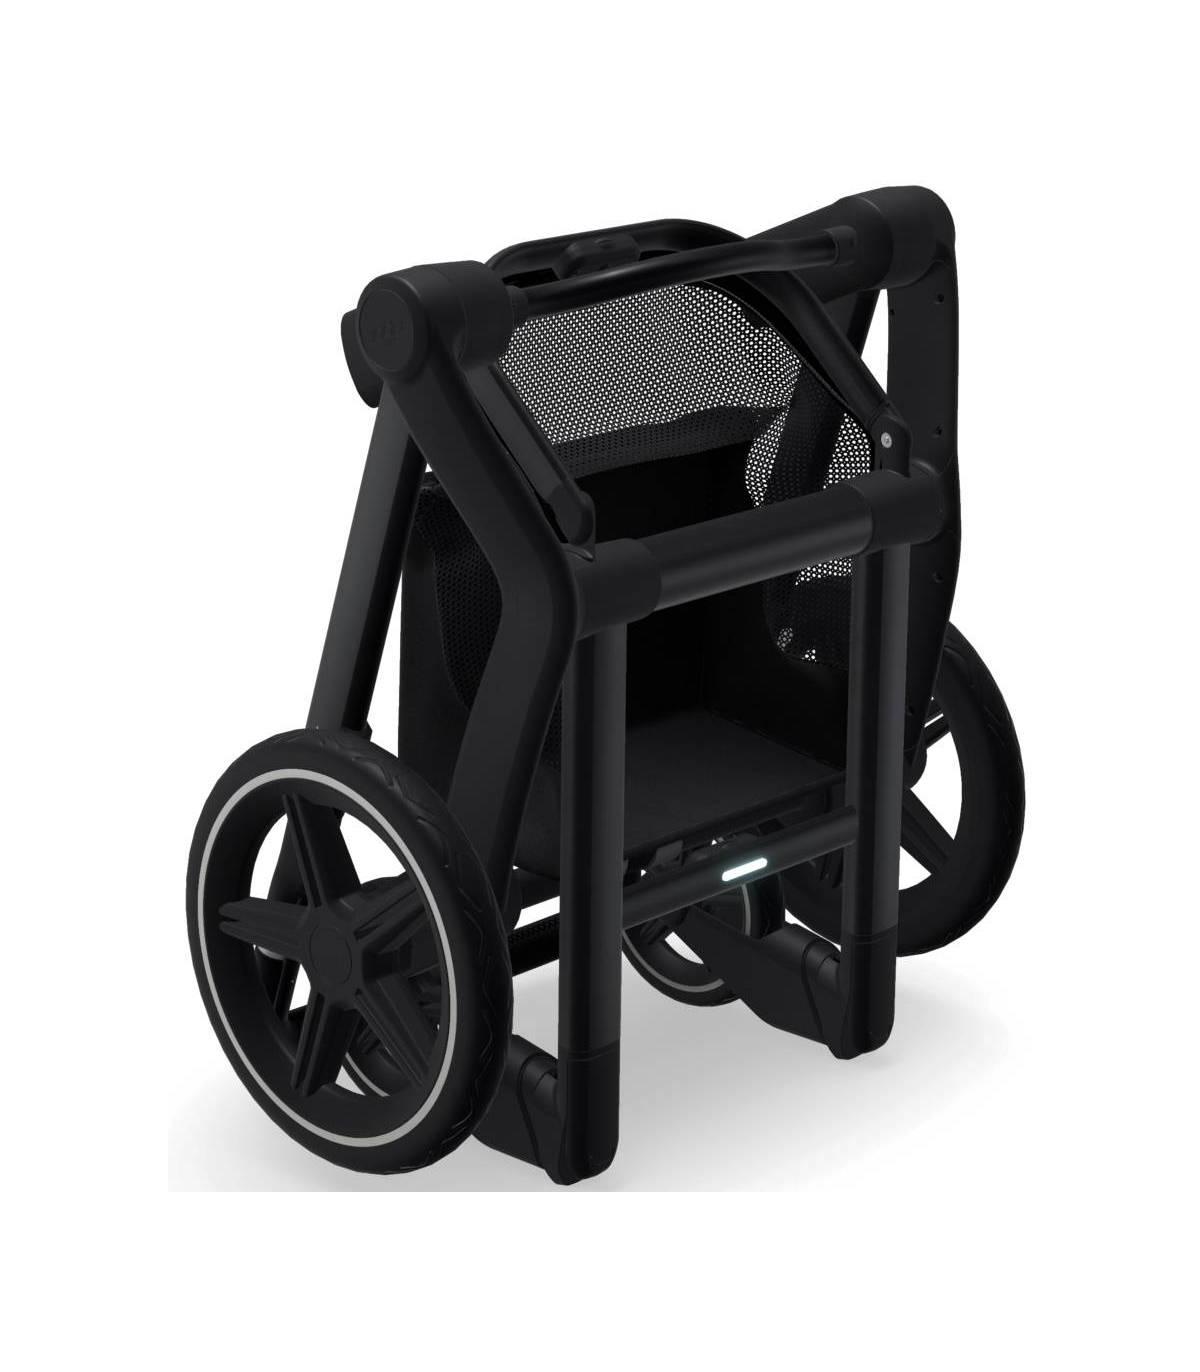 Joolz DAY+ SET-Angebot Brilliant Black (Kombi-Kinderwagen-SET Day-Plus)